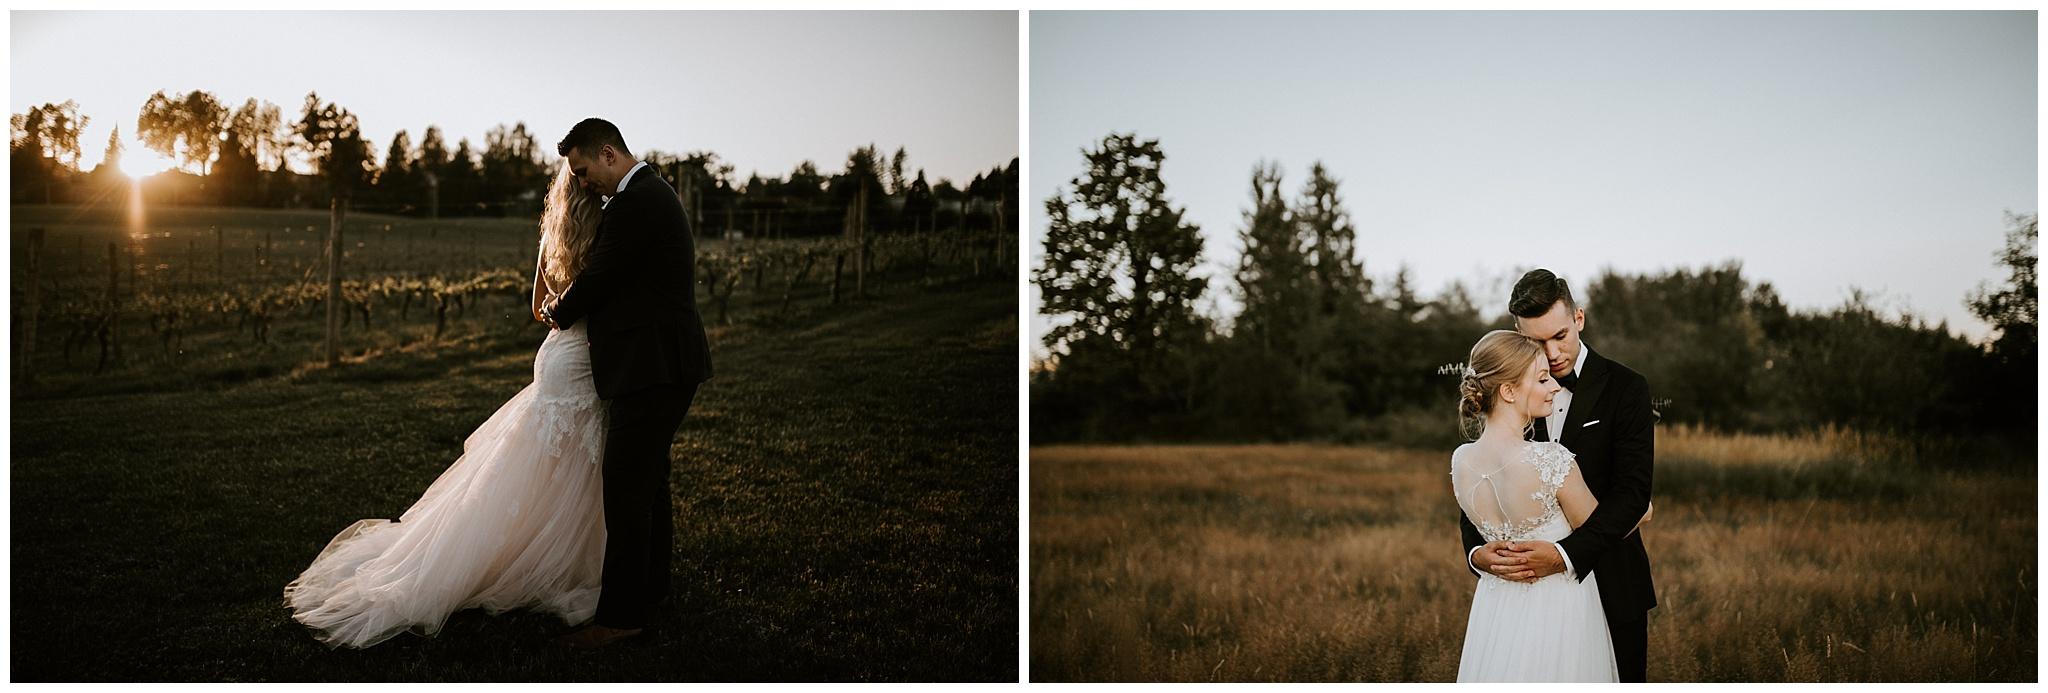 vancouver-wedding-photography-02.JPG